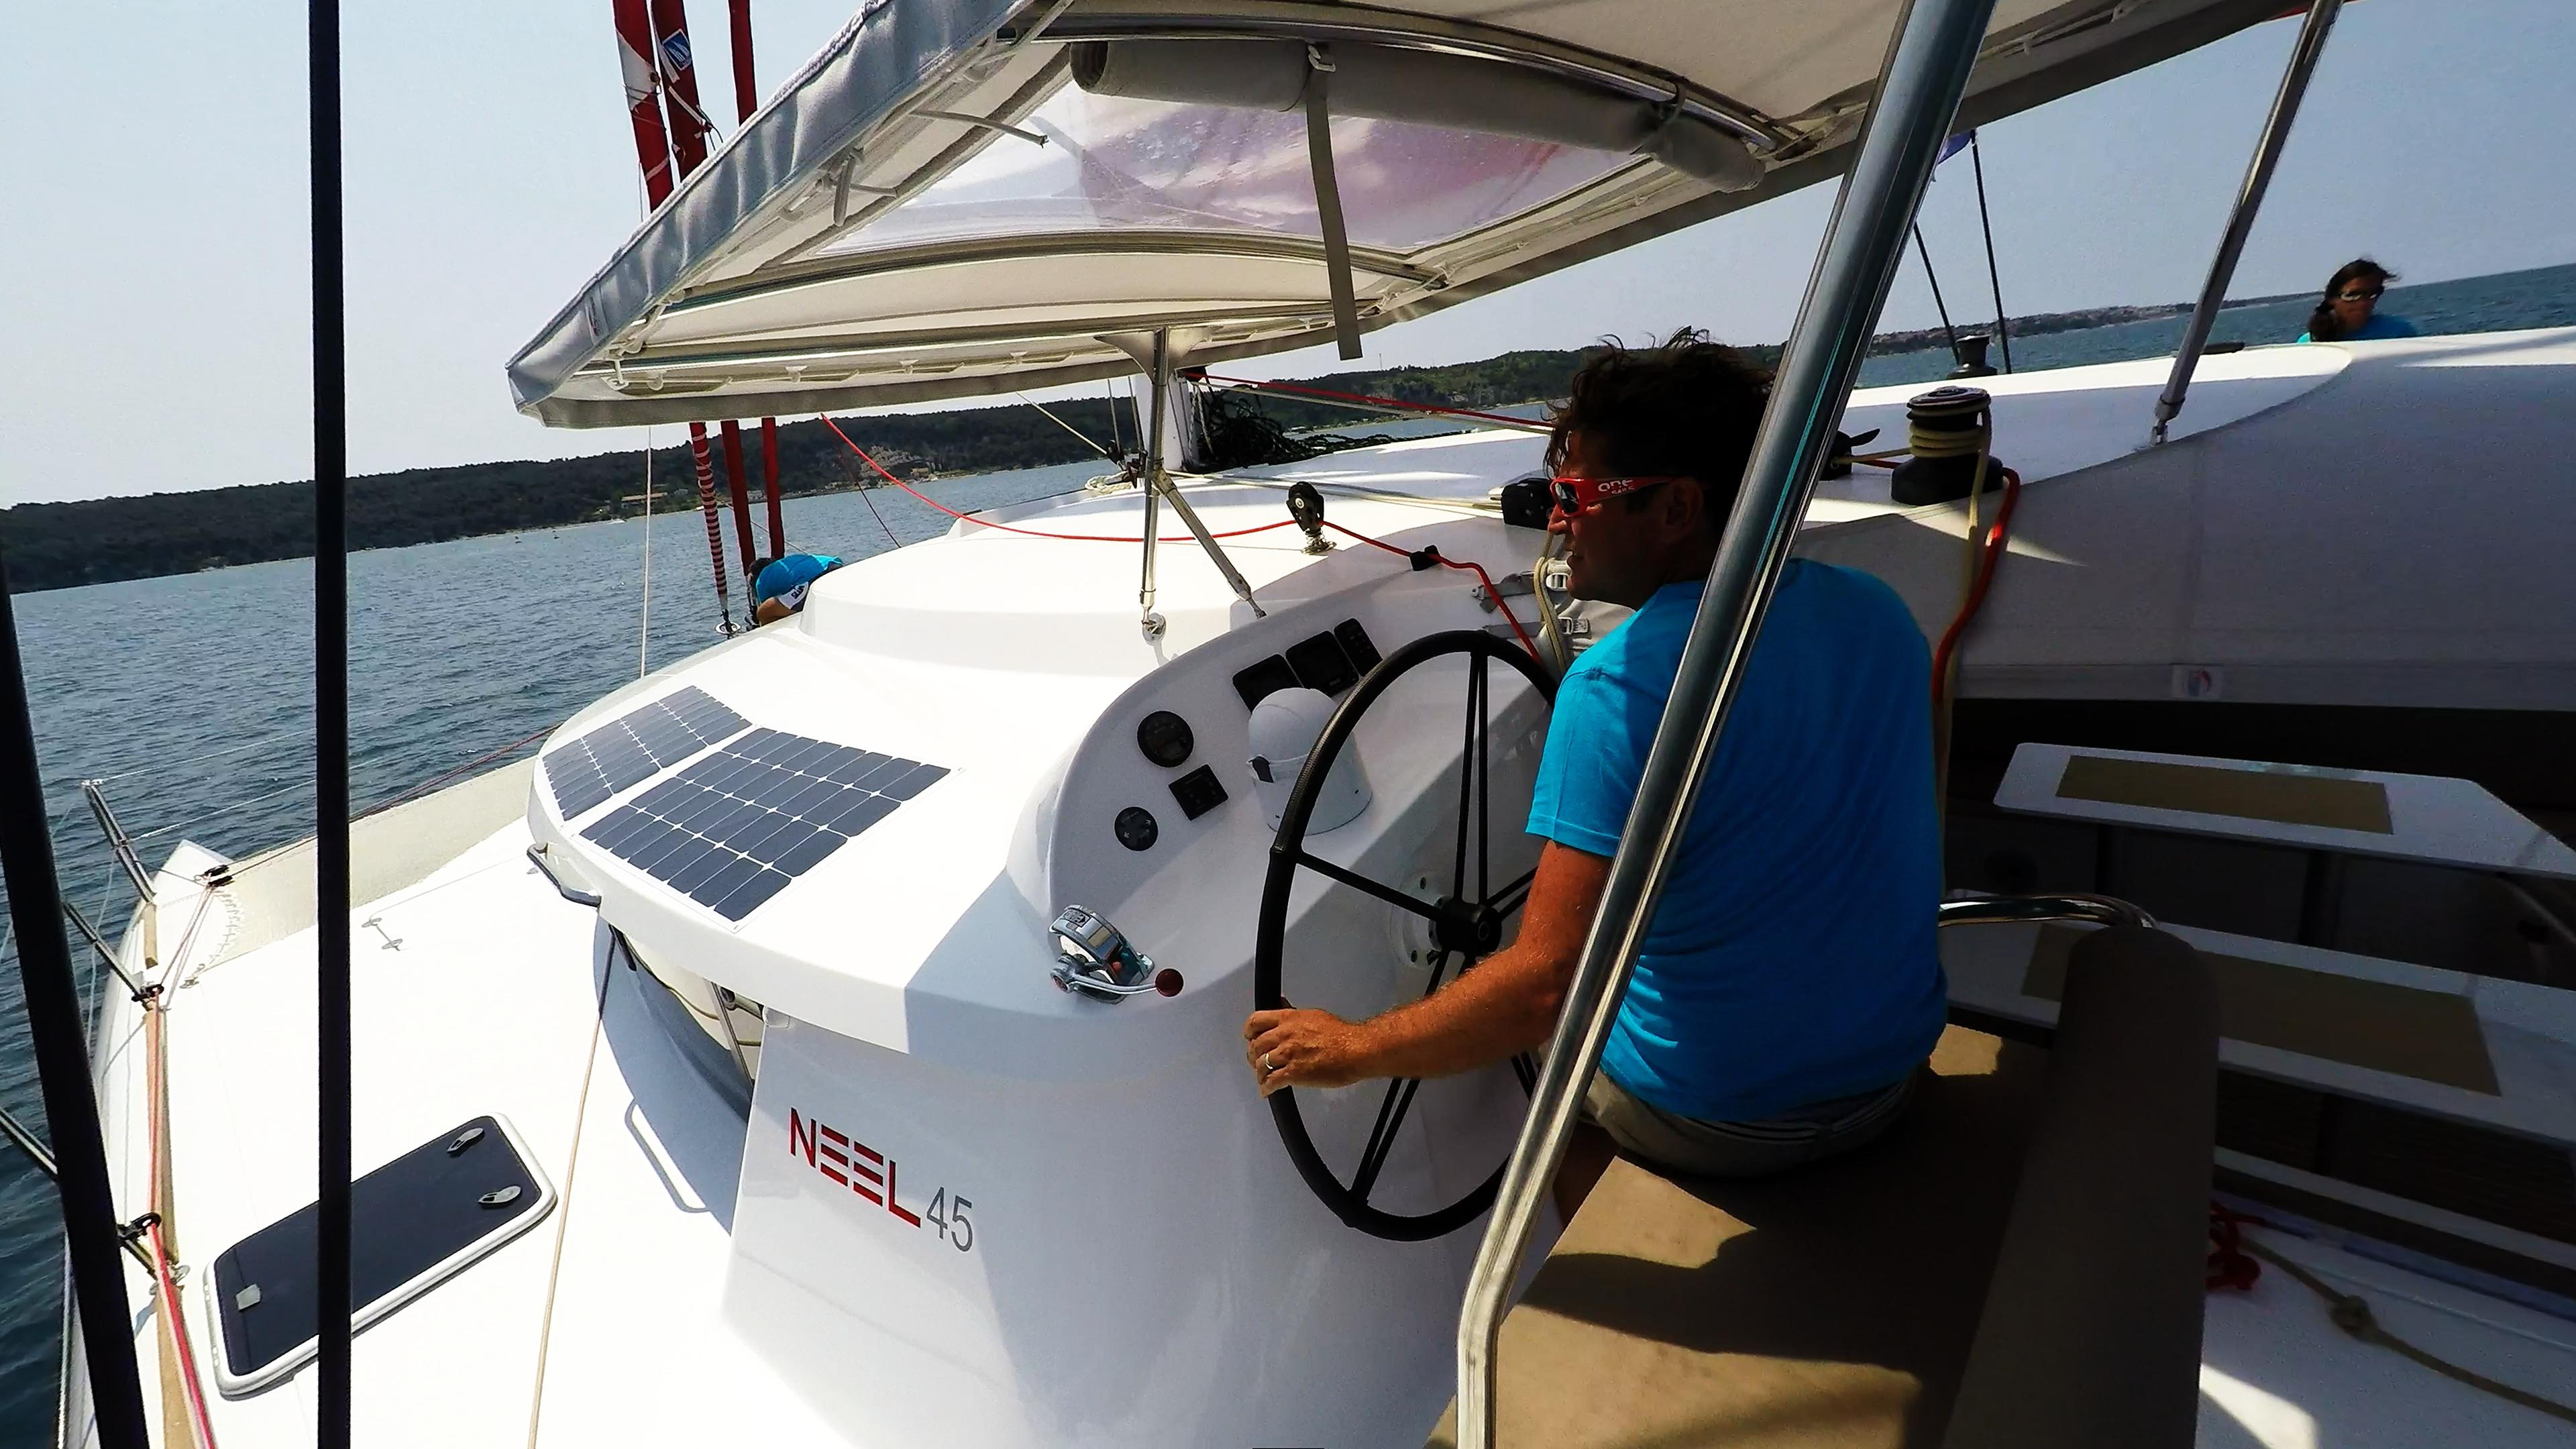 skipper in cockpit of trimaran sailing yacht neel 45